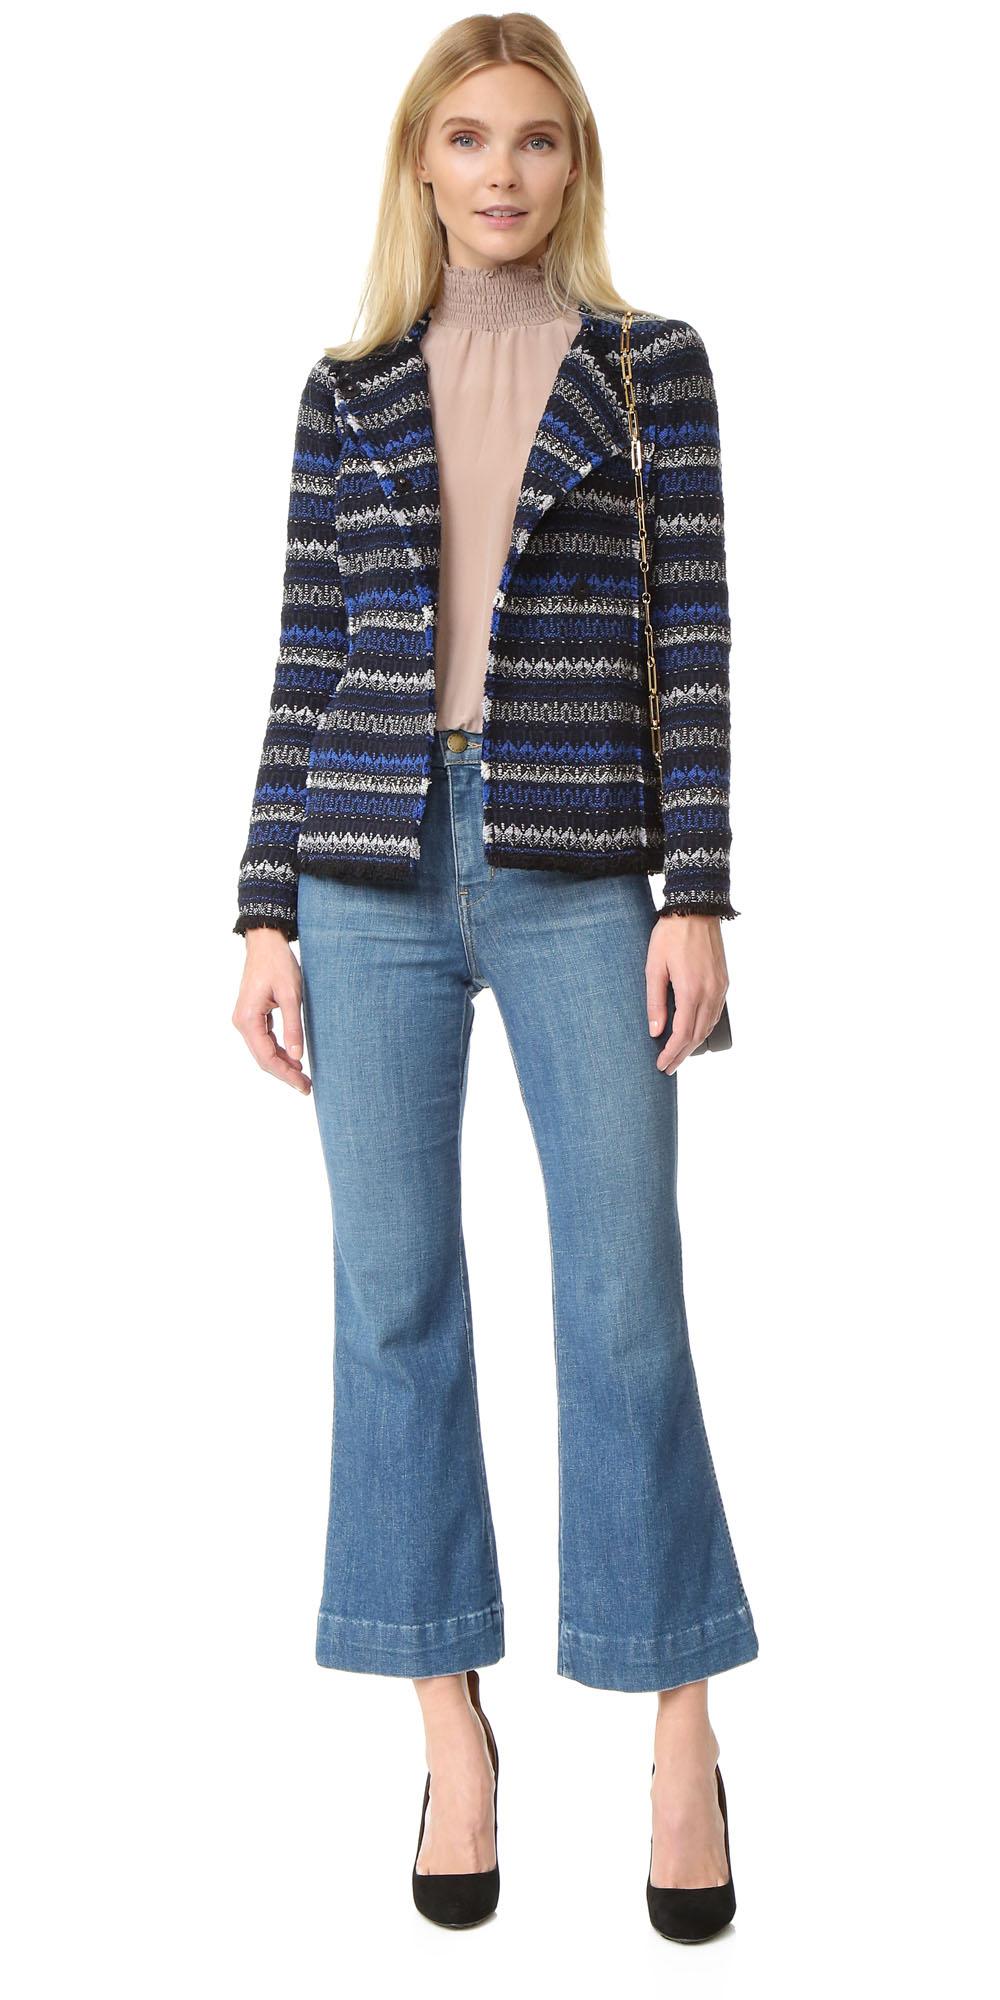 blue-light-crop-jeans-tan-top-blouse-blonde-blue-navy-jacket-lady-fall-winter-lunch.jpg